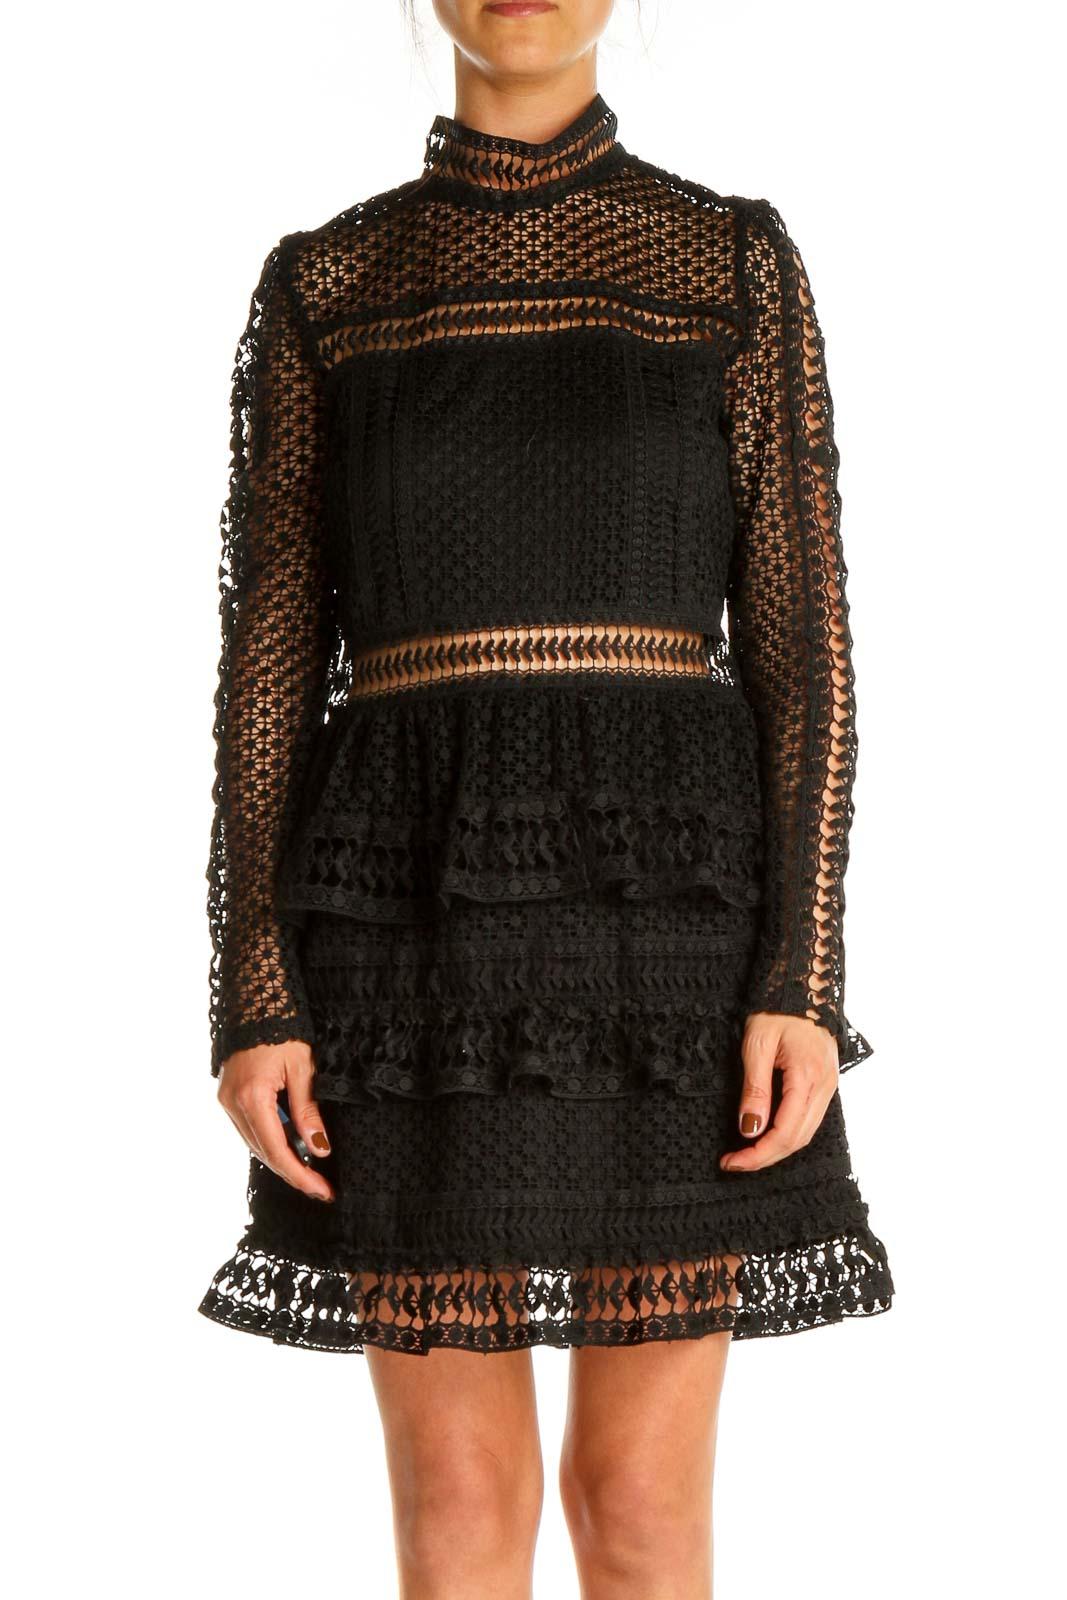 Black Cocktail Fit & Flare Dress Front